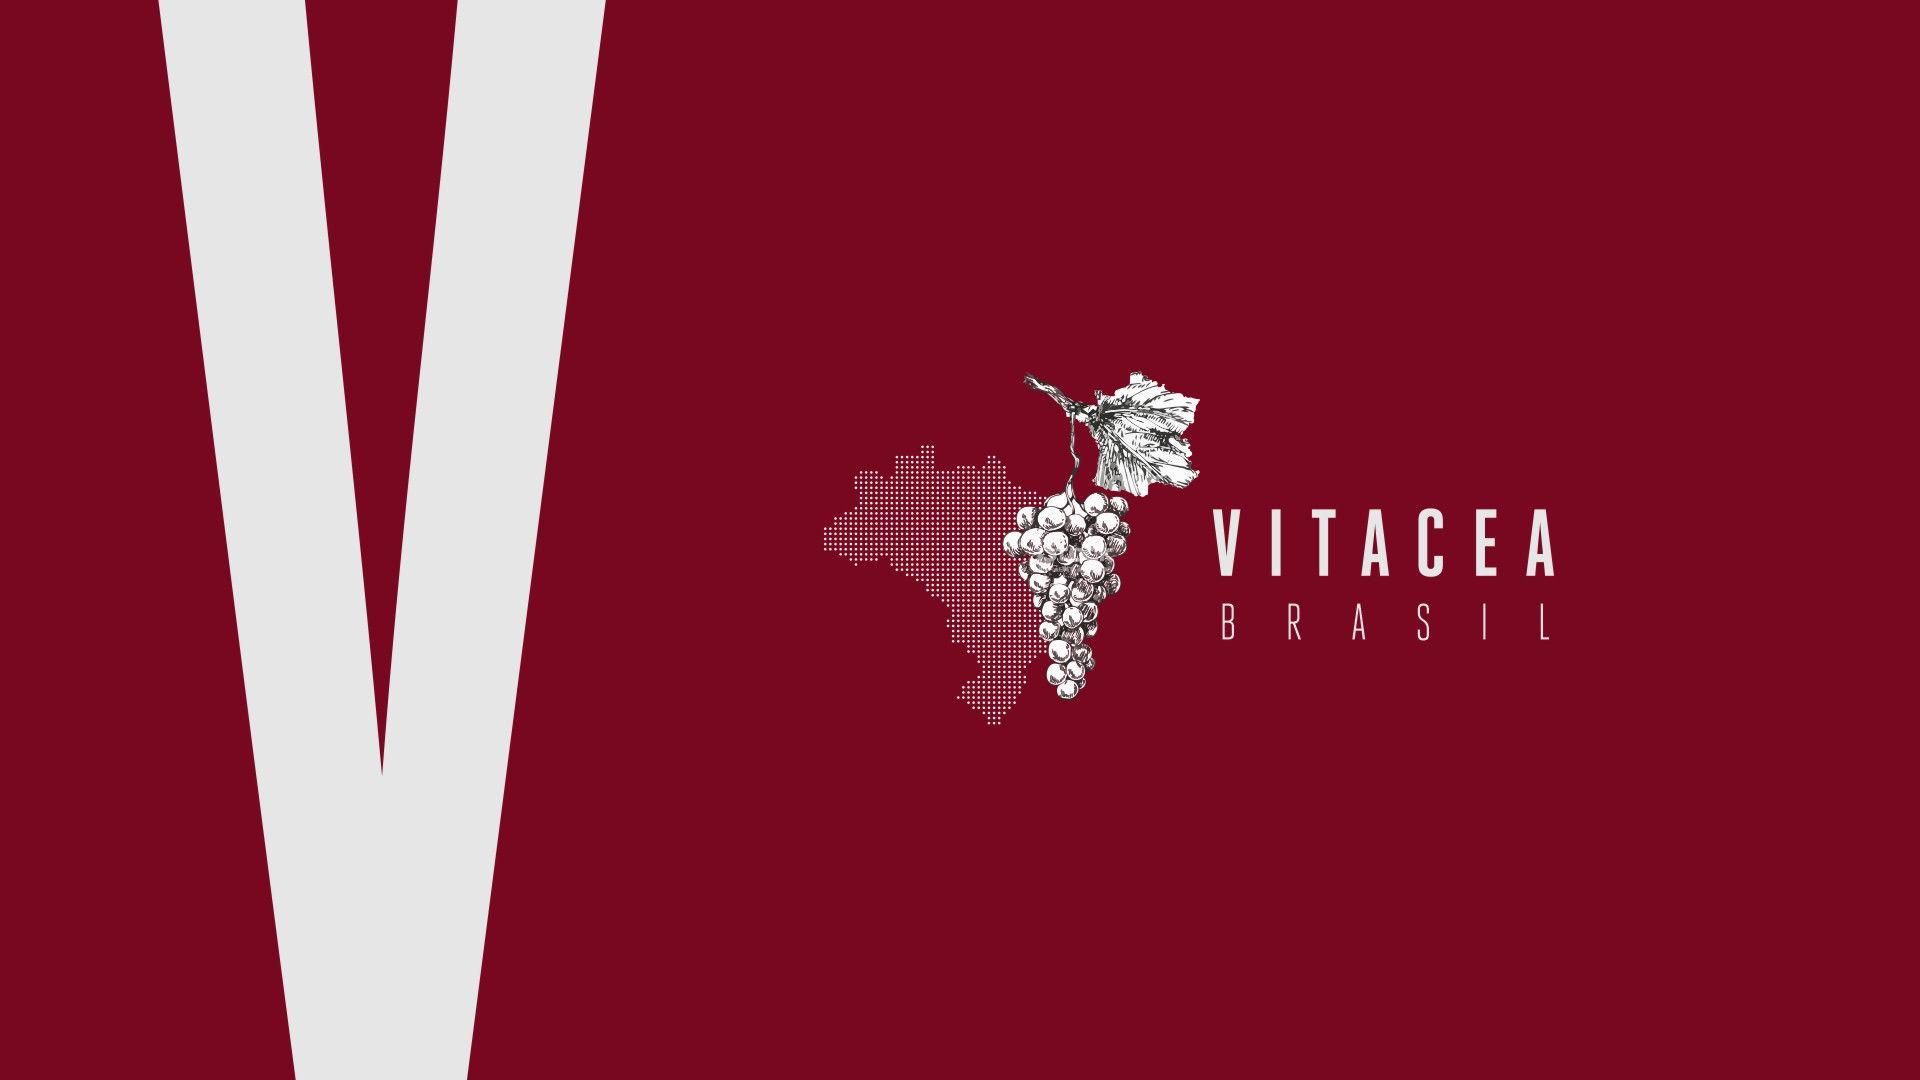 nathan-franco-vitacea-brasil-design-03.j